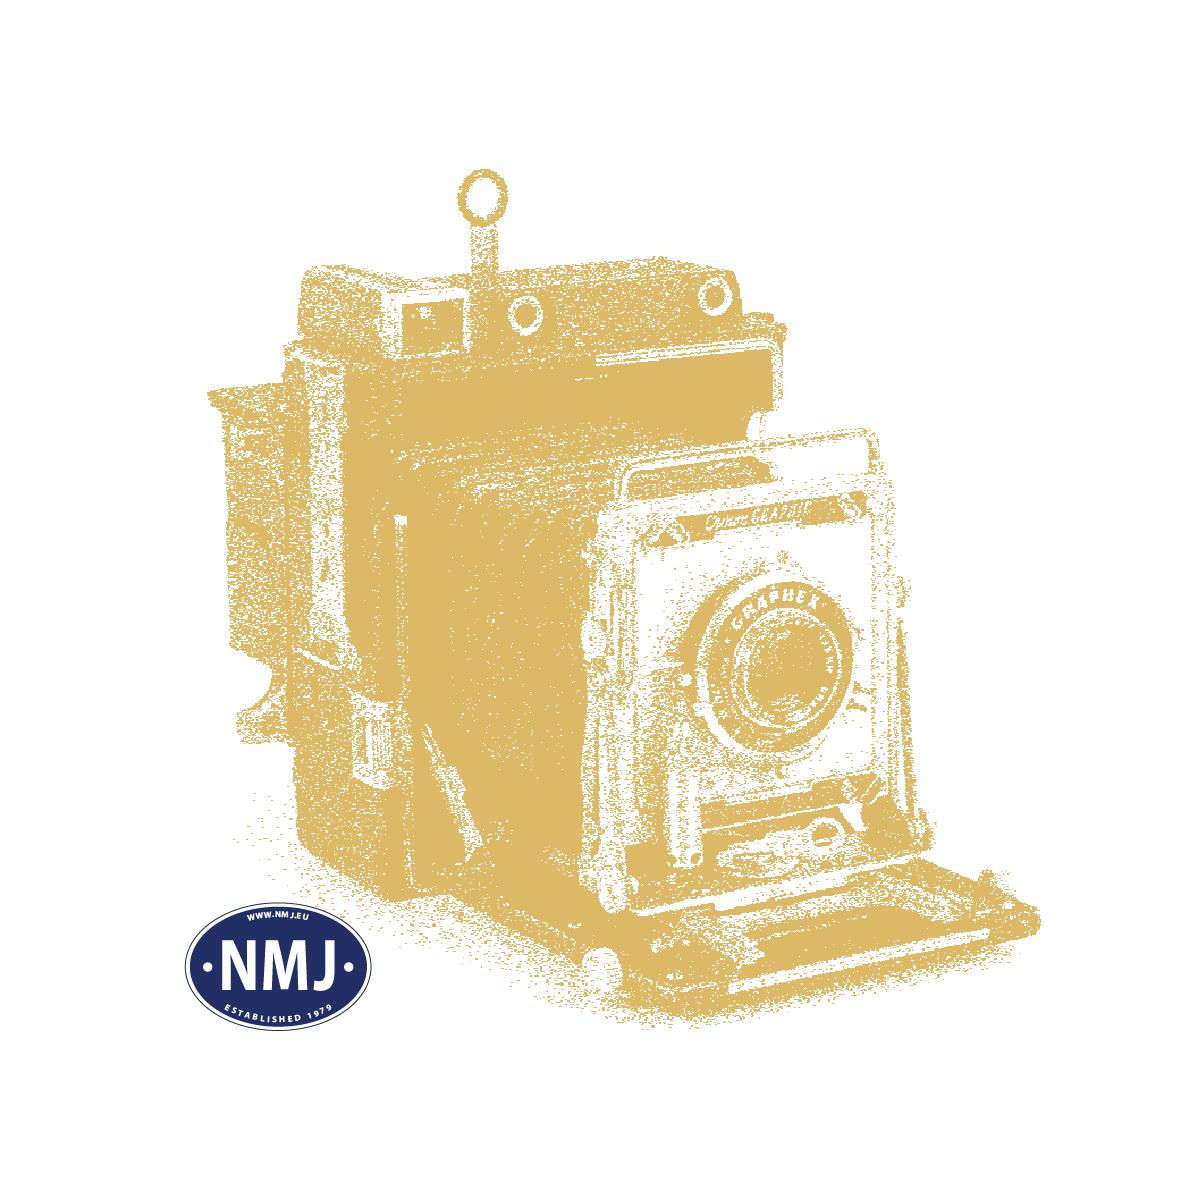 NMJKAT20 - NMJ Katalog 2020, Superline, Topline, Skyline